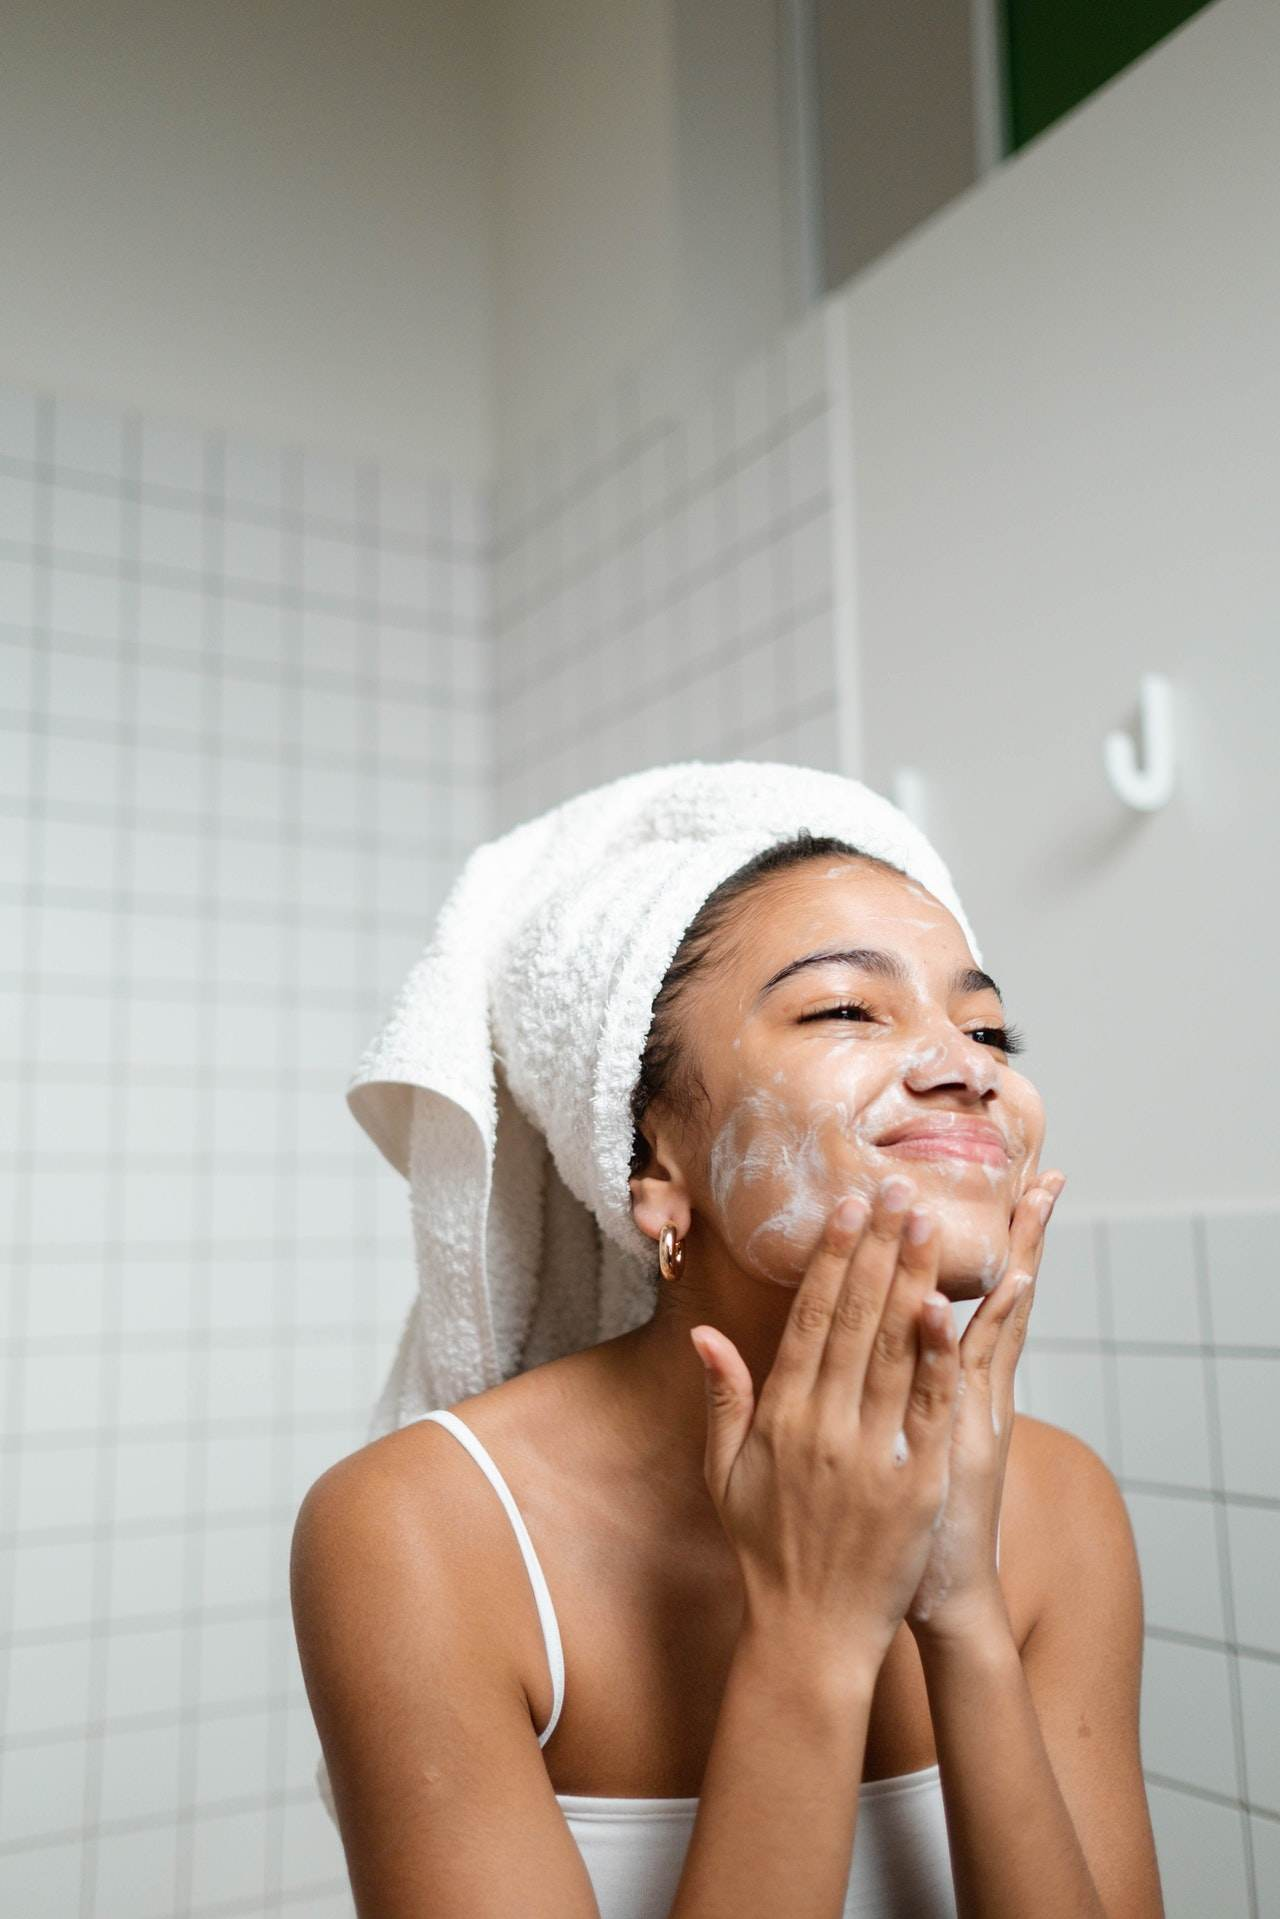 Produk Skincare Wajib Sebelum Berolahraga